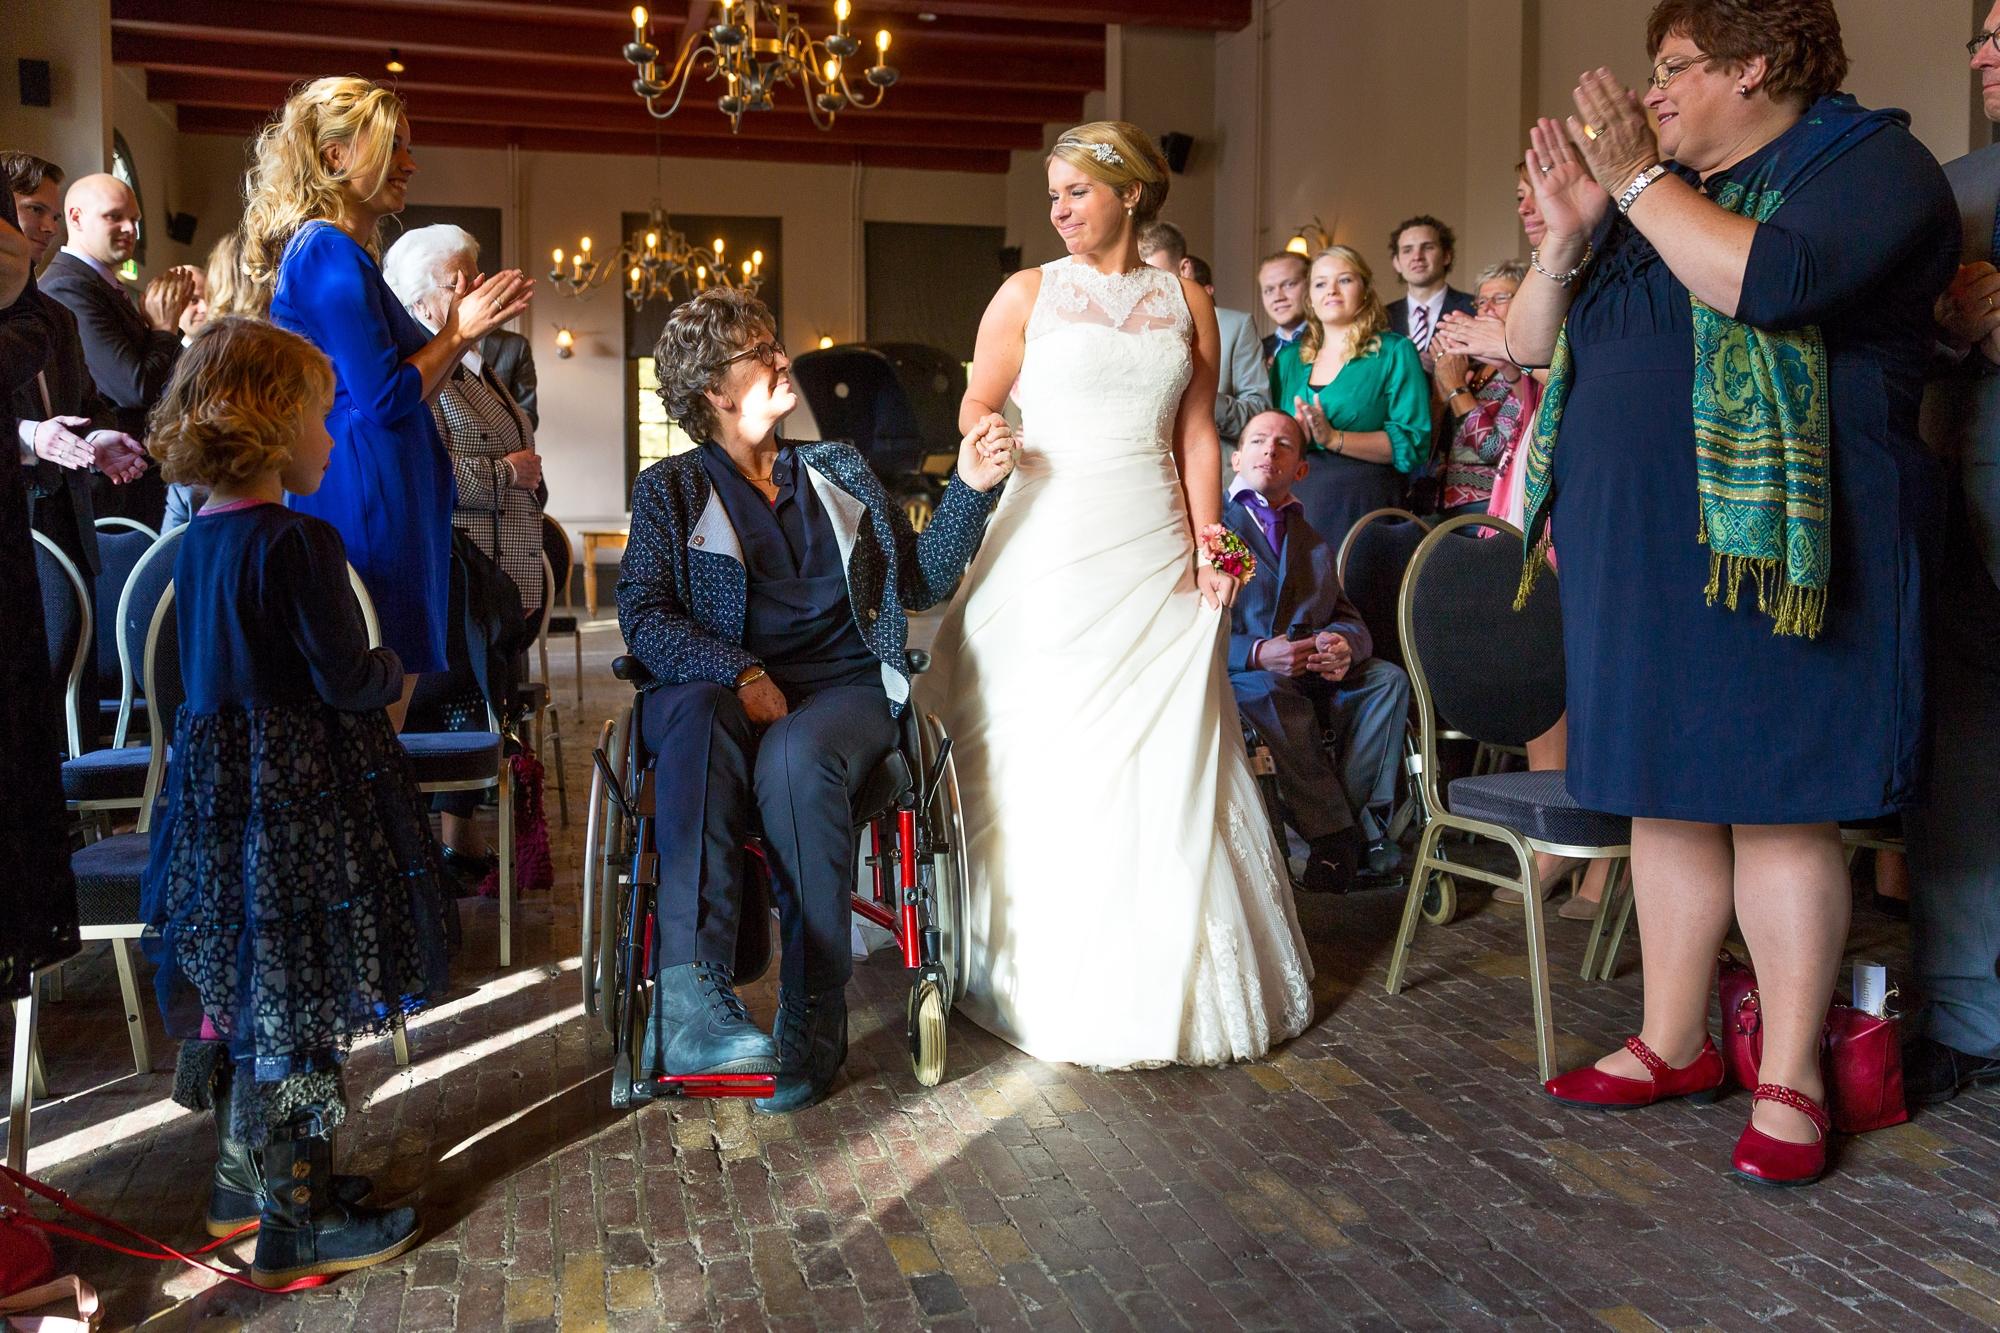 bruidsfotografie-trouwreportage-huwelijksfotografie-bruidsfotograaf-feestfotografie-Ingeborg en Martijn-33.jpg